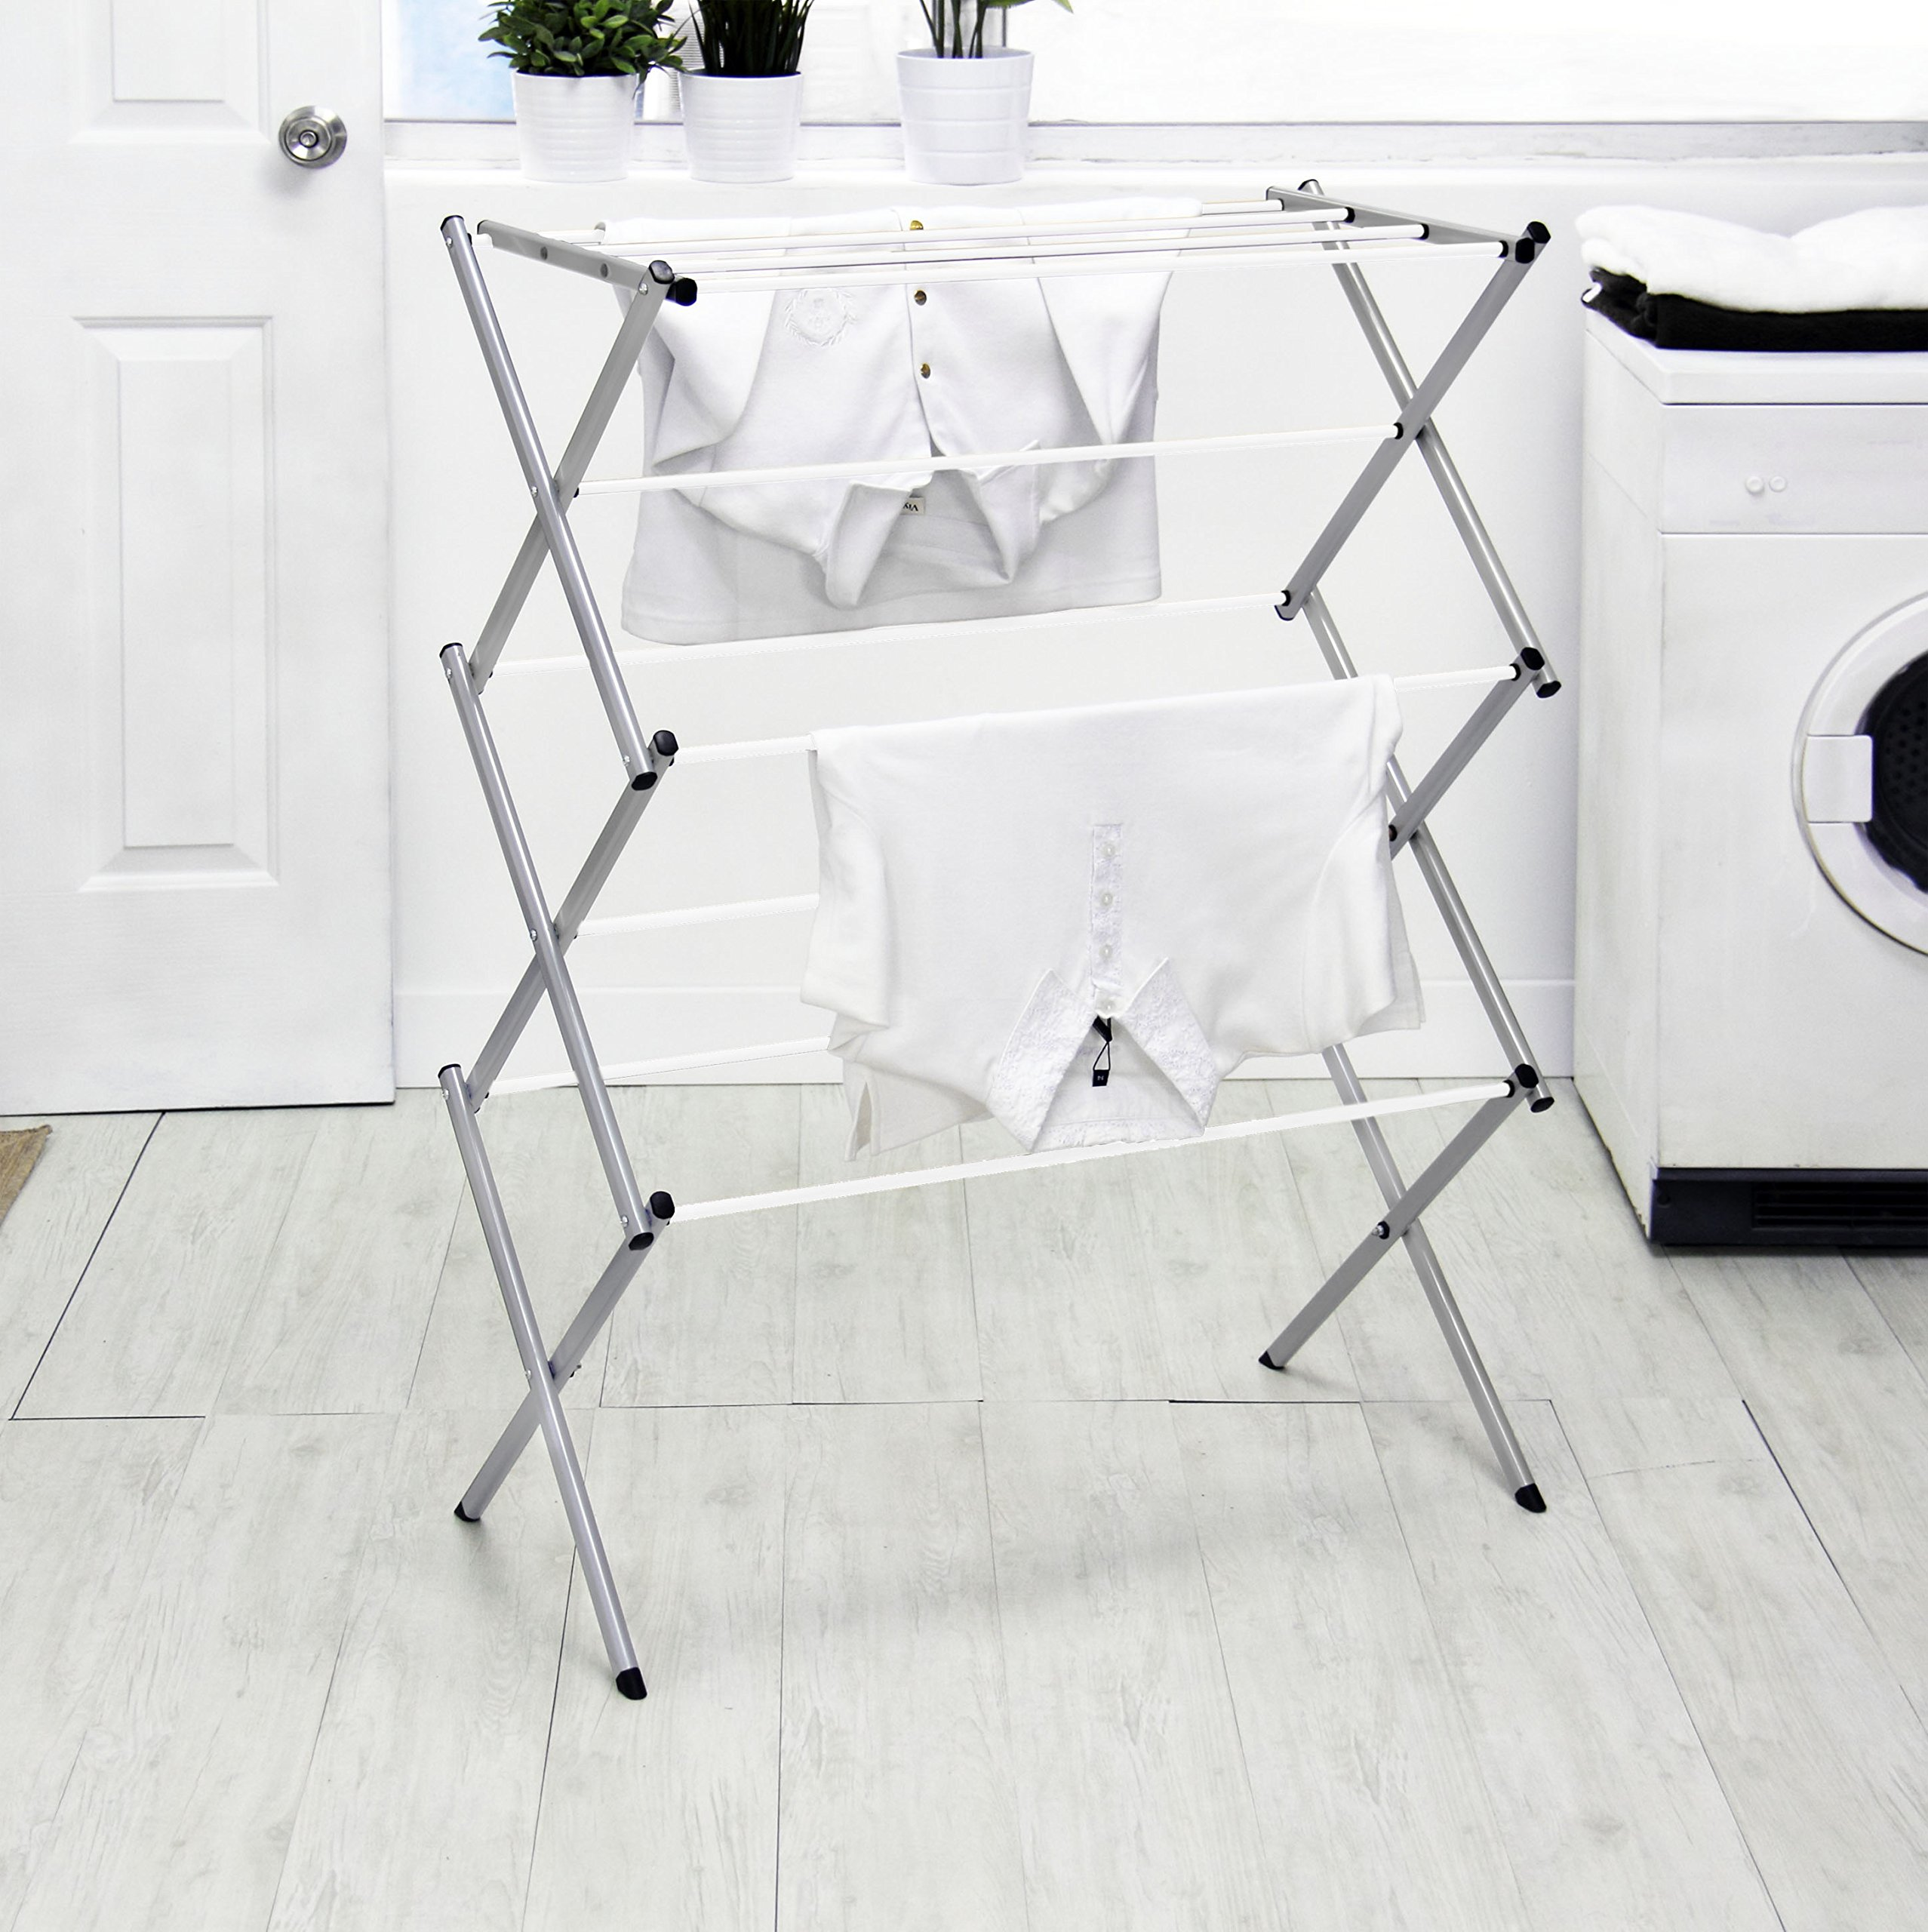 Vanderbilt Home Drying Rack in Silver/White Spindles - (41'' High)